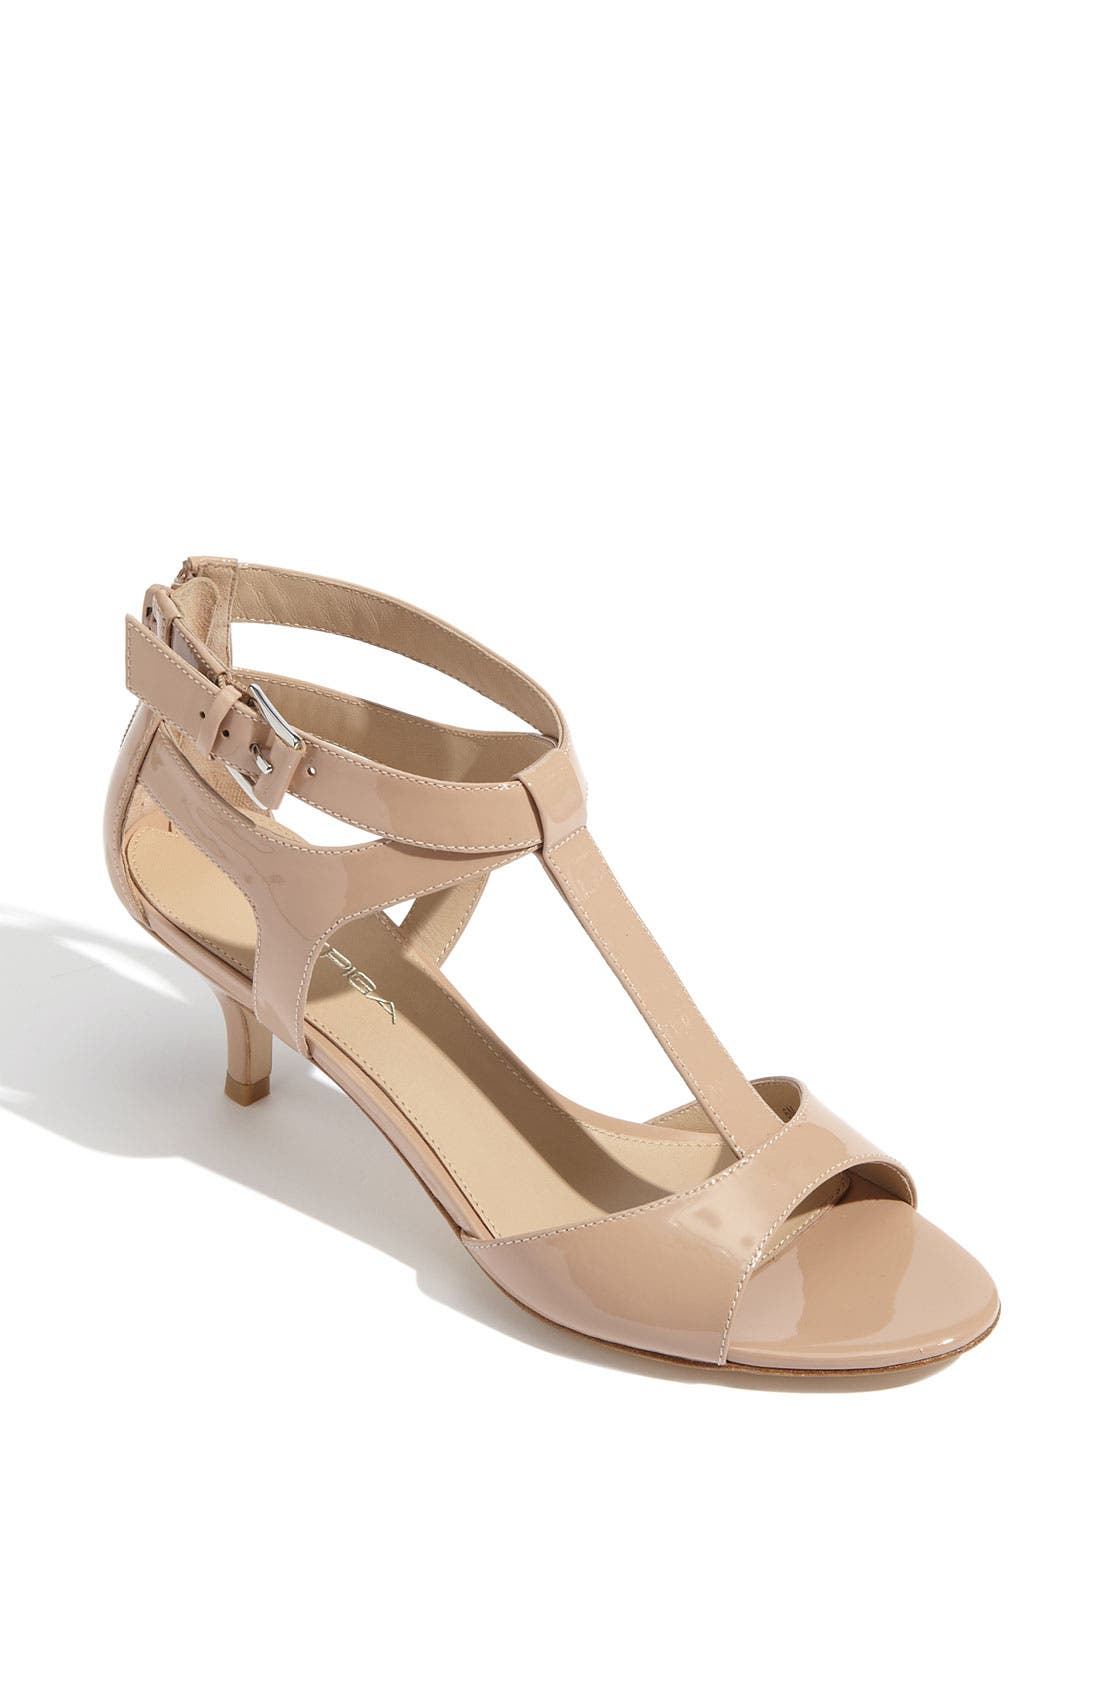 Alternate Image 1 Selected - Via Spiga 'Lindsie' Sandal